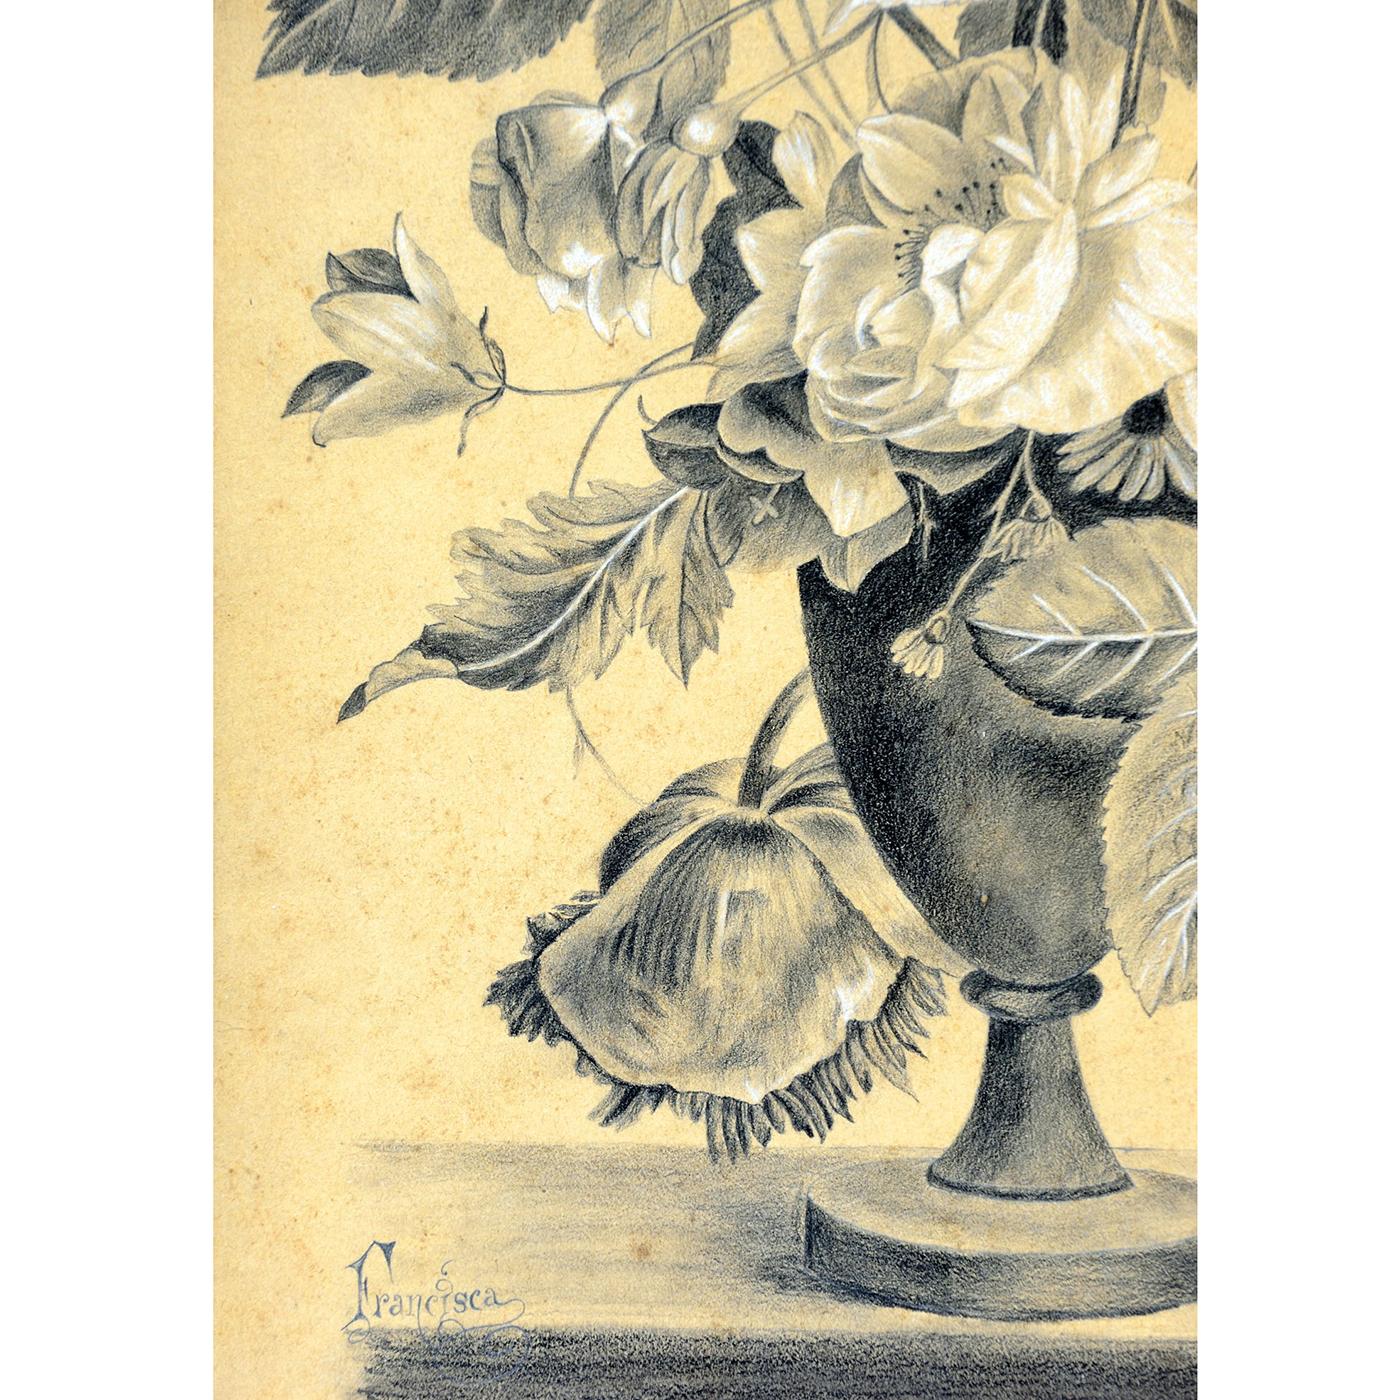 Francisca Ferrer Dibujo A Lápiz Y Carboncillo Sobre Cartón Siglo Xix Xx